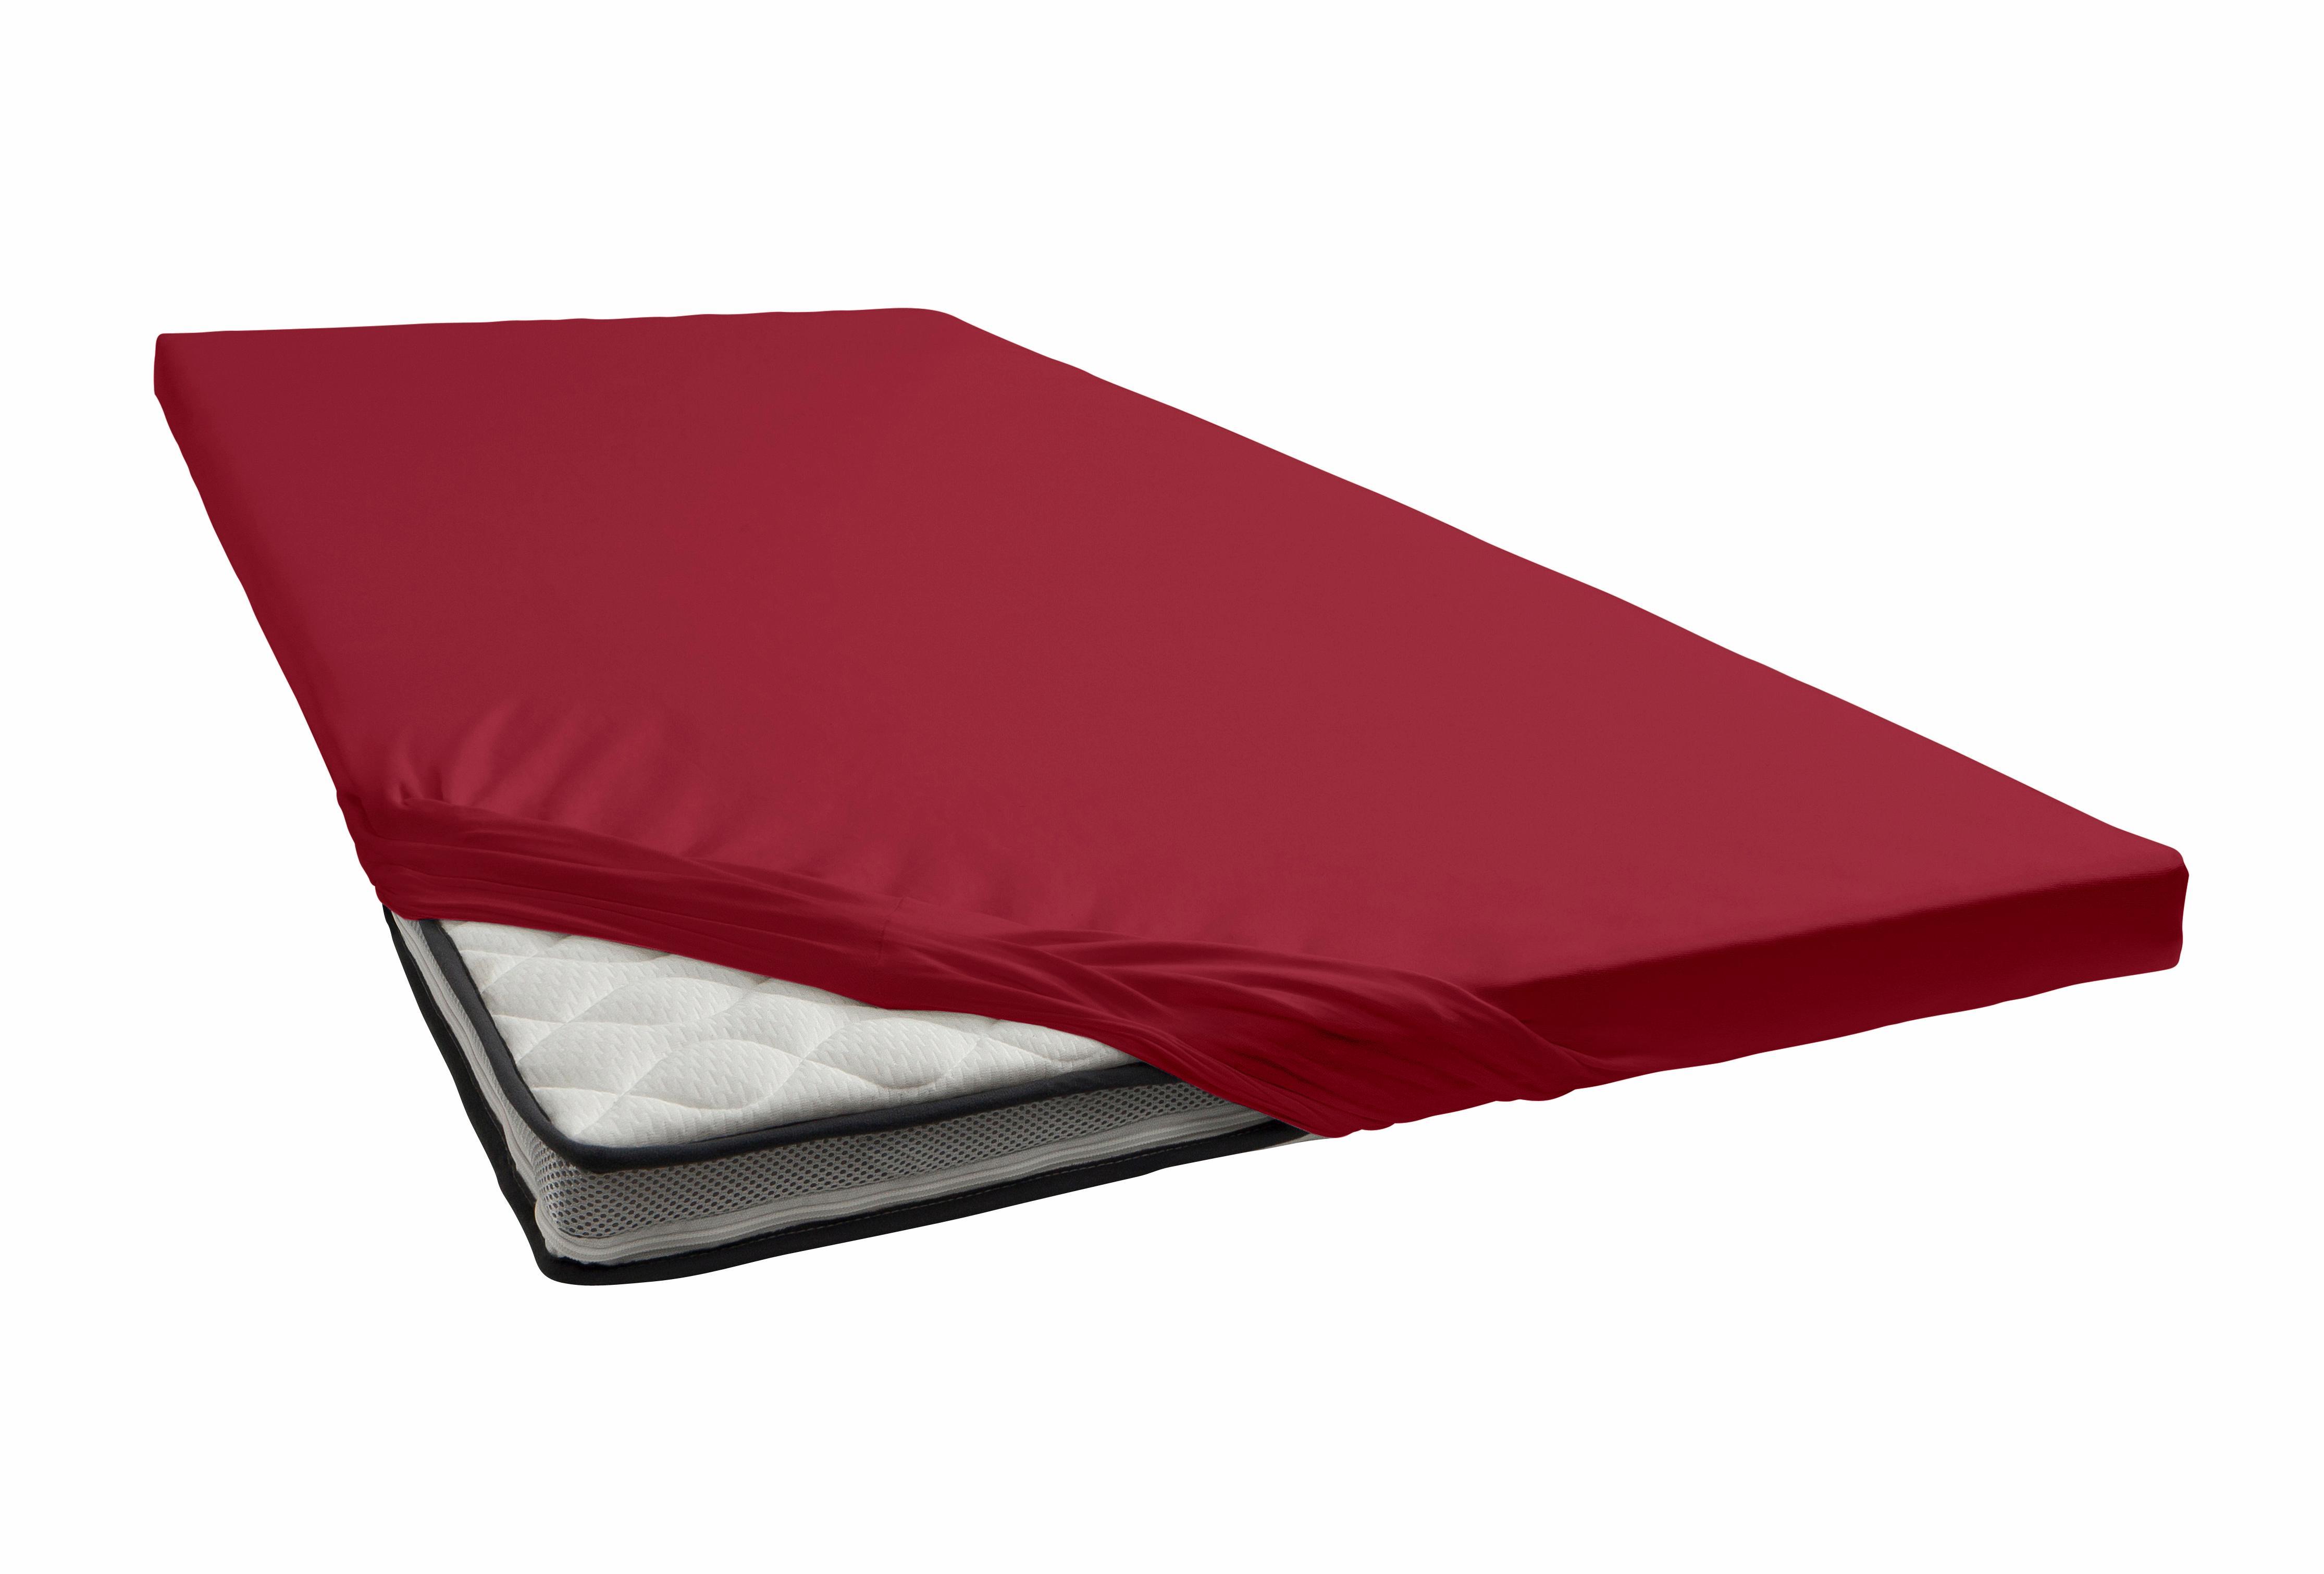 spannbettlaken janine jersey elasthan f r topper auf. Black Bedroom Furniture Sets. Home Design Ideas